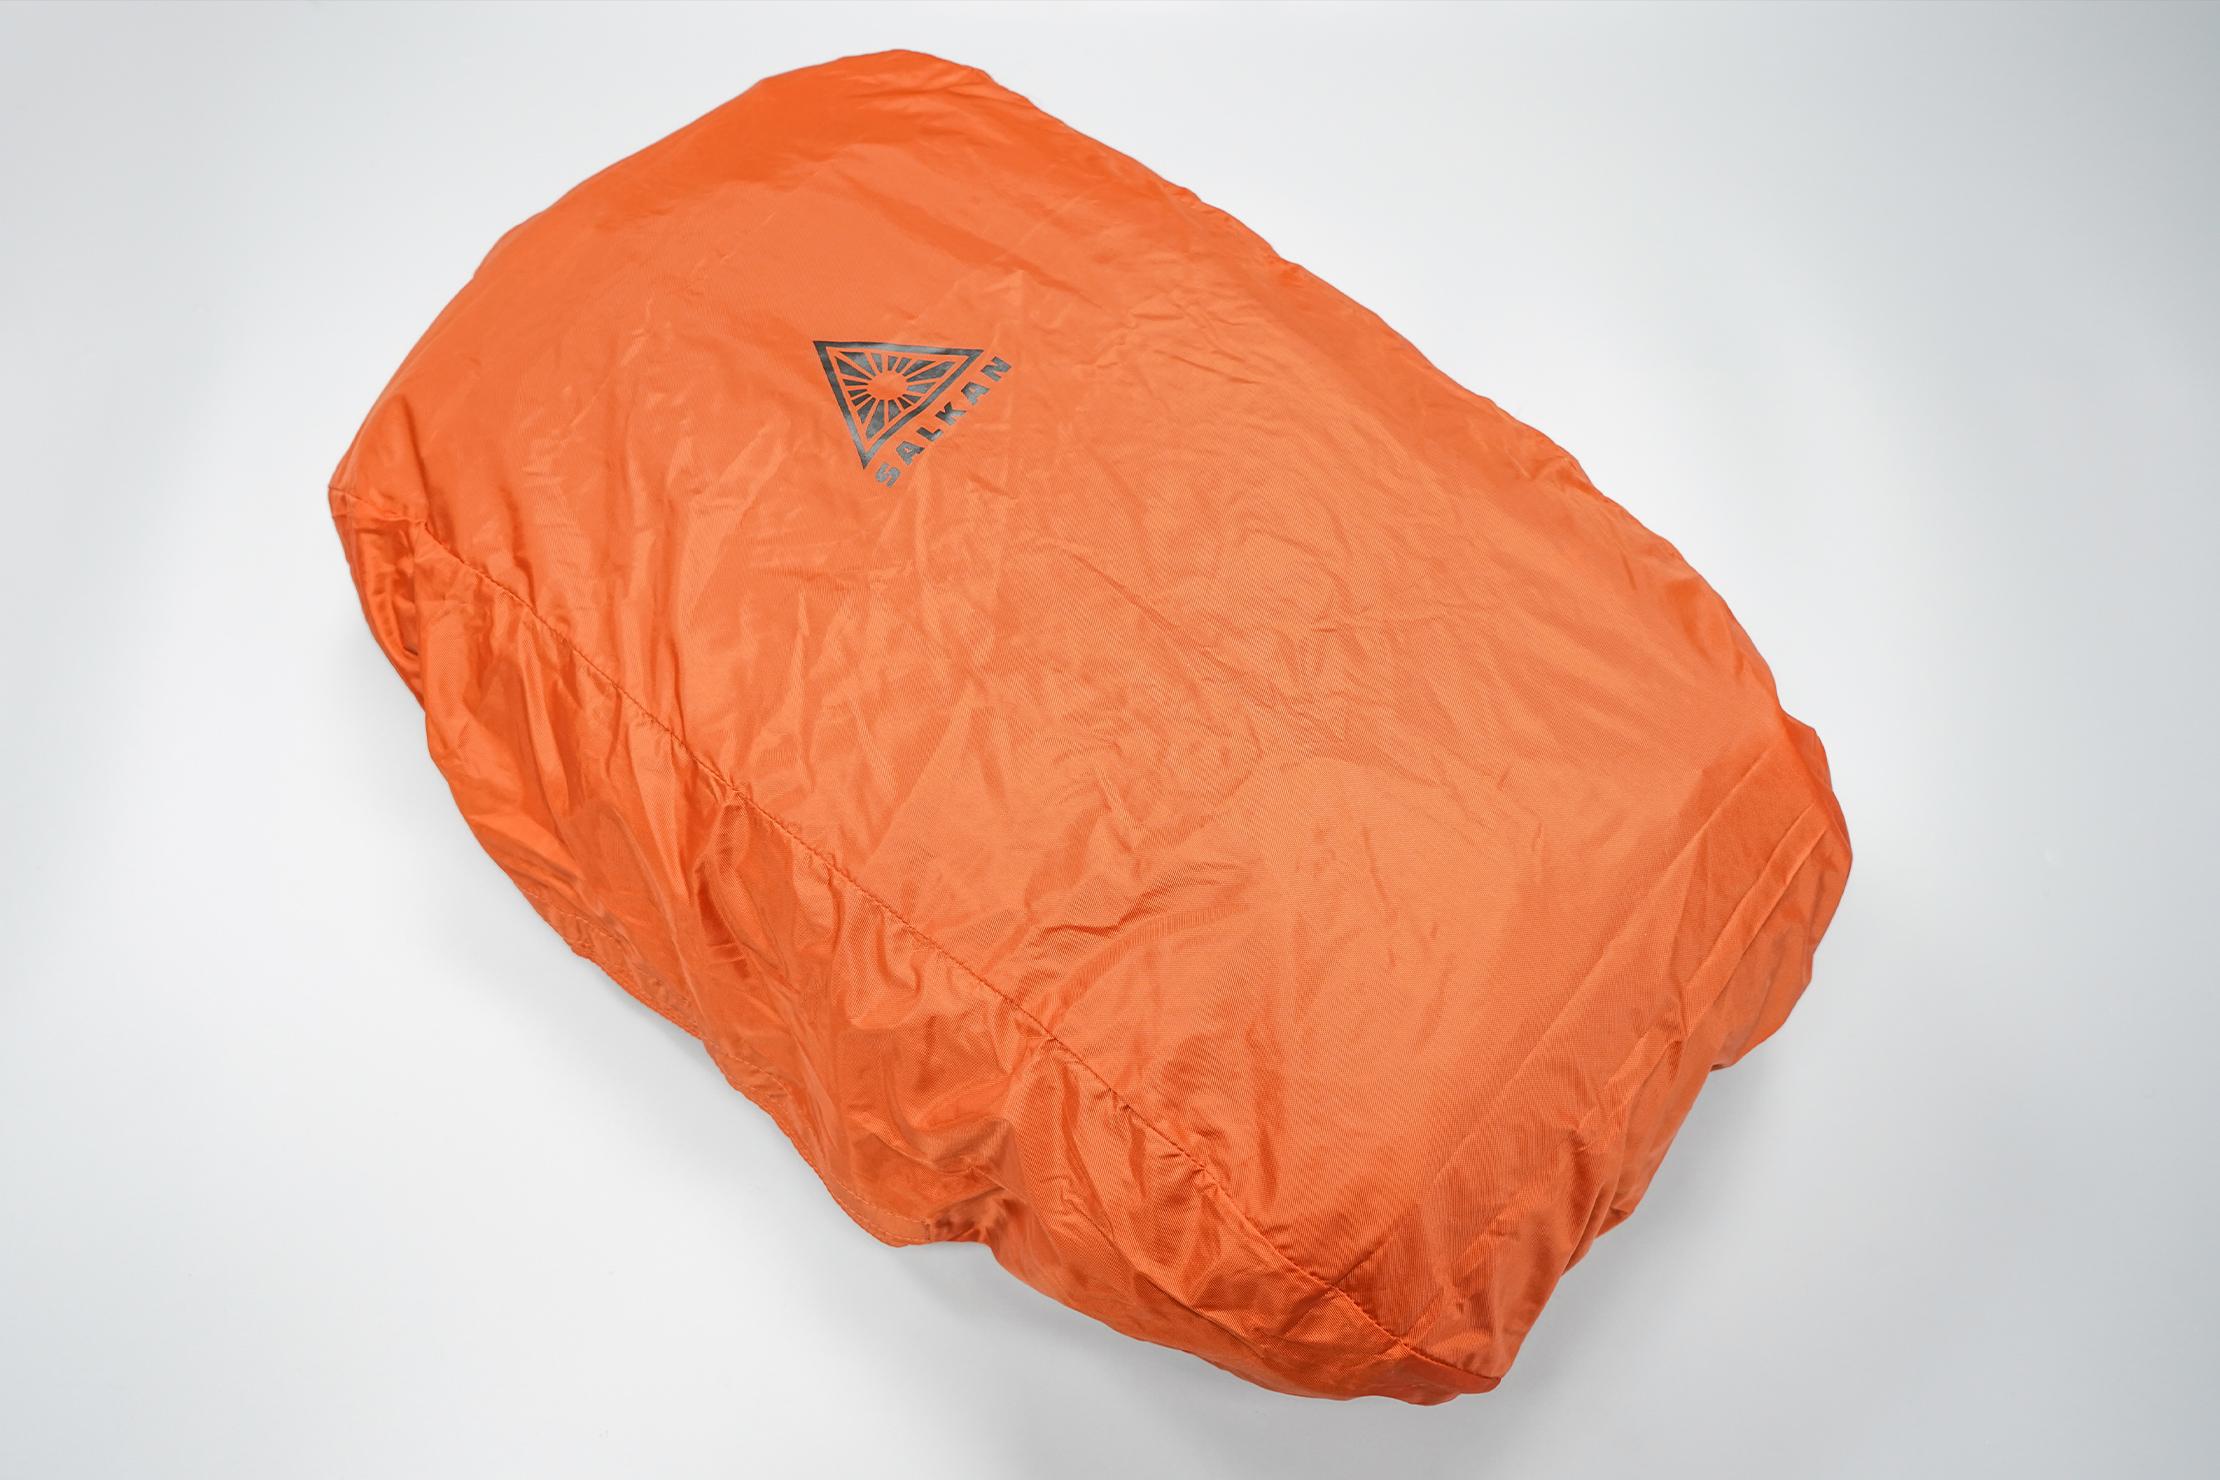 Salkan Backpacker | The Flight&Rain cover in use